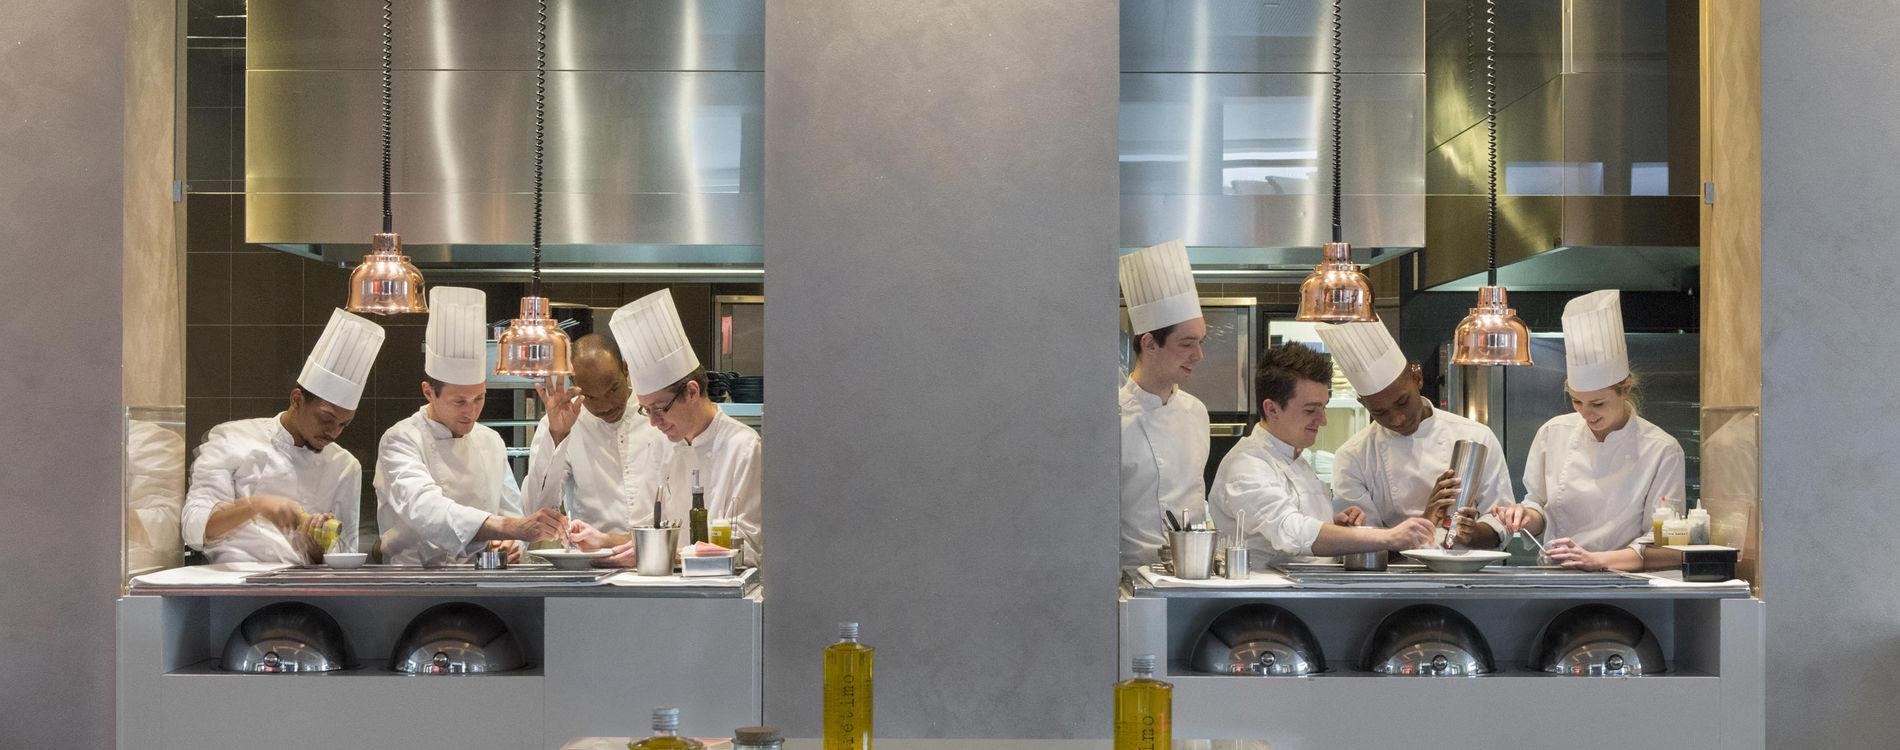 Monte-Carlo Bay Blue Bay Restaurant Monaco Chef Marcel Ravin